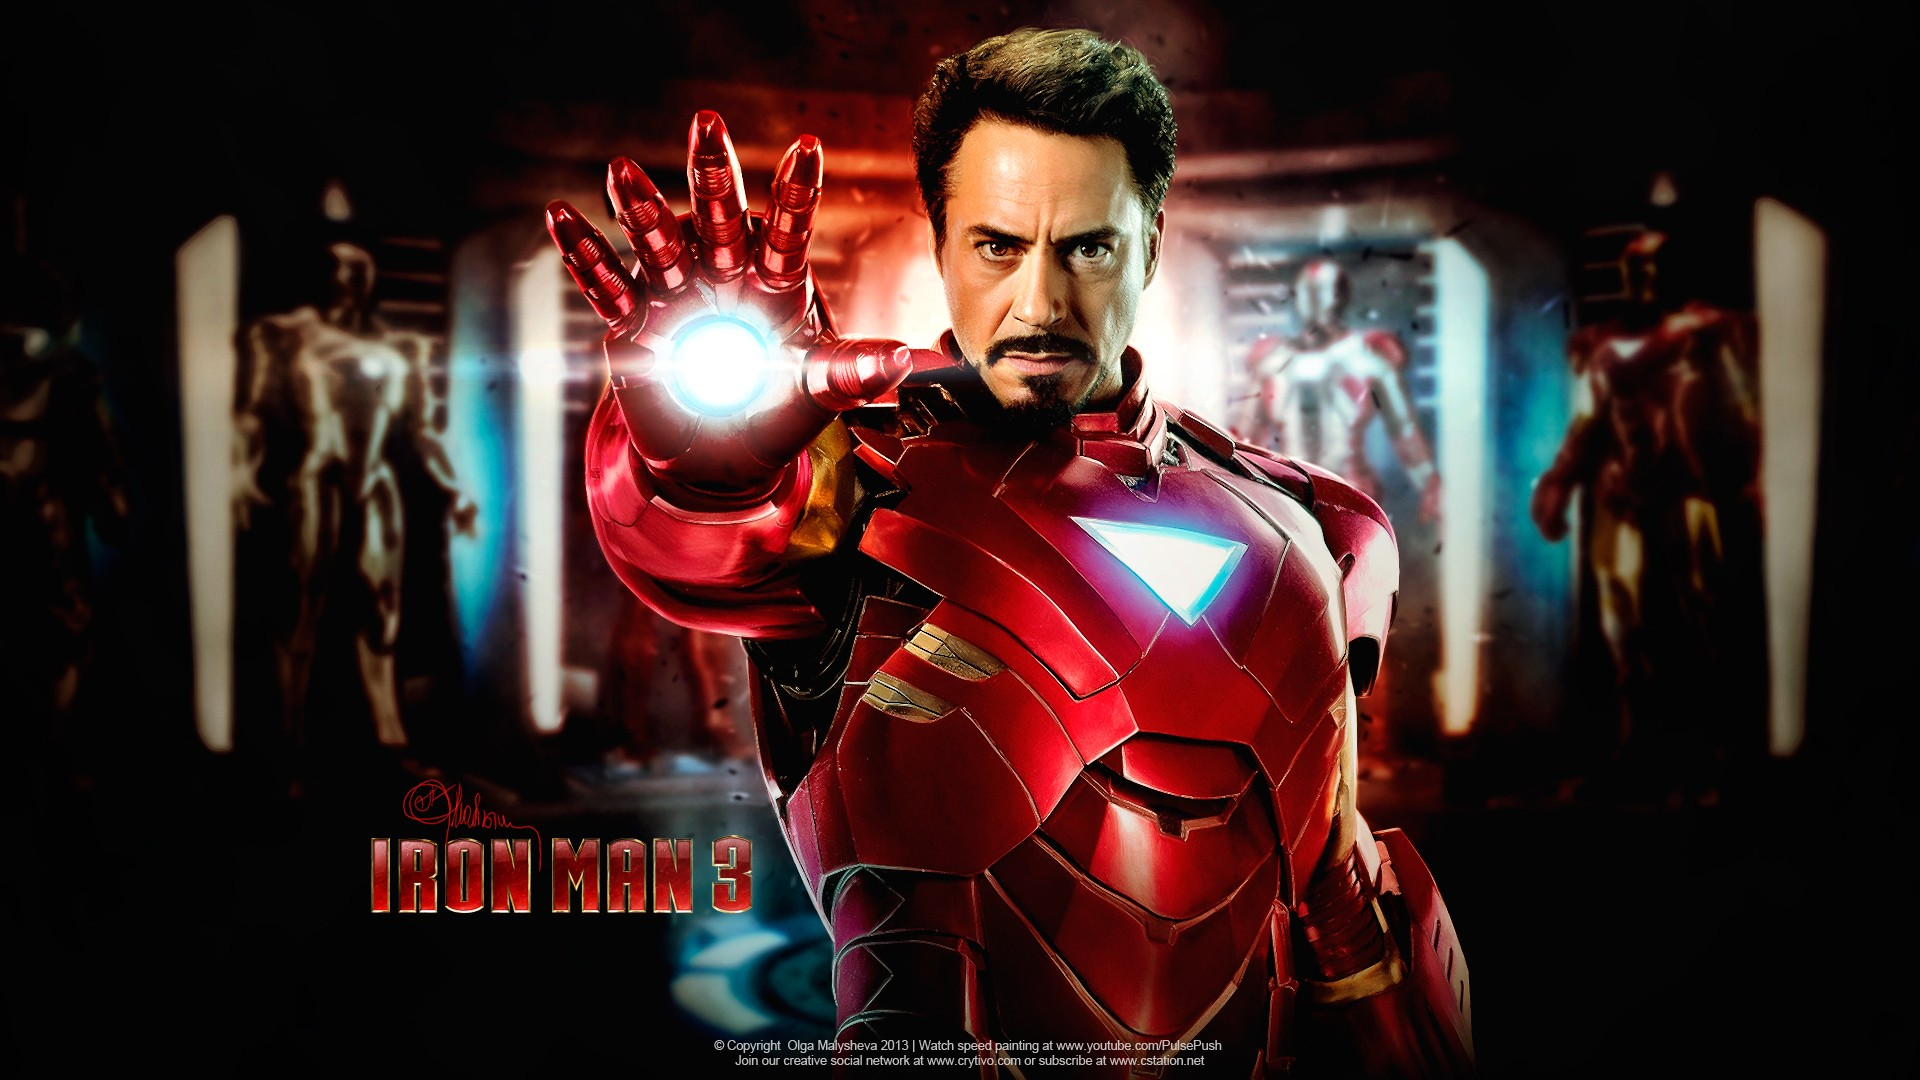 Iron Man Comic Logo Iron Man 3 Movies Comics w